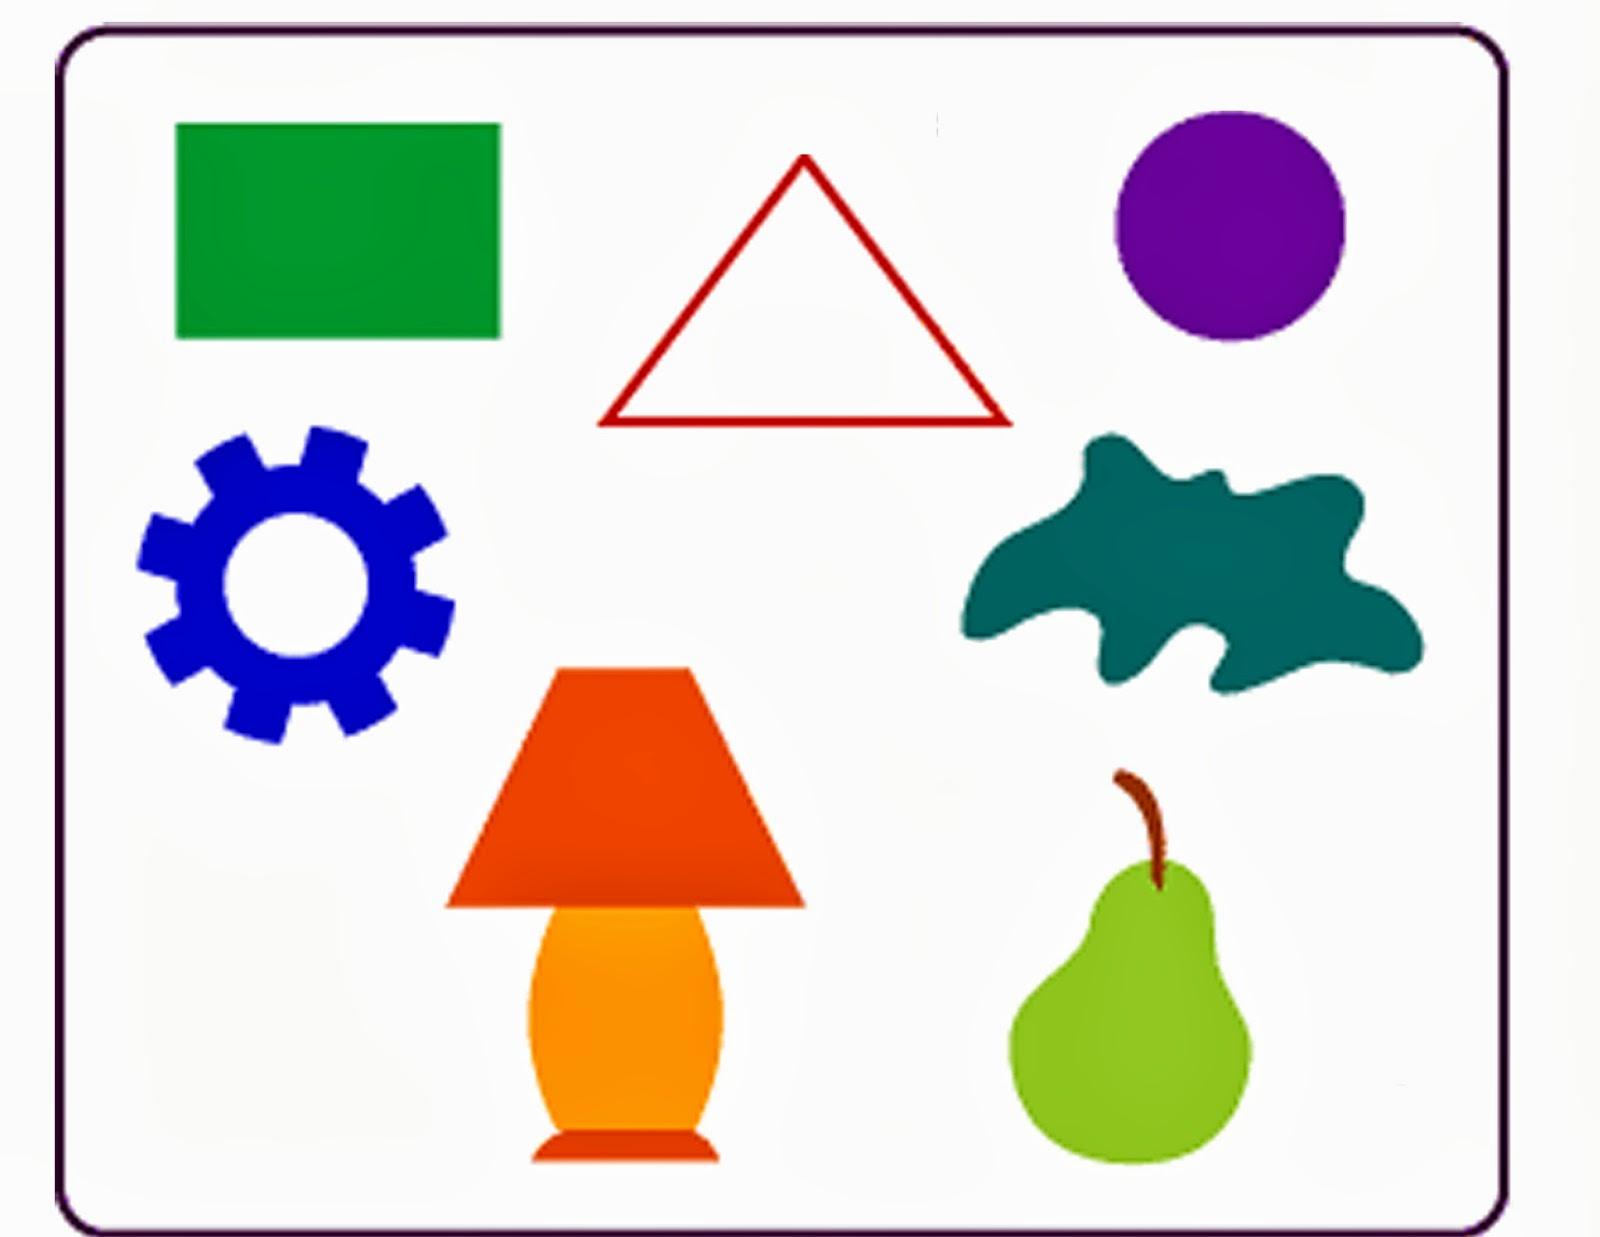 2D Organic Shapes - Bing images